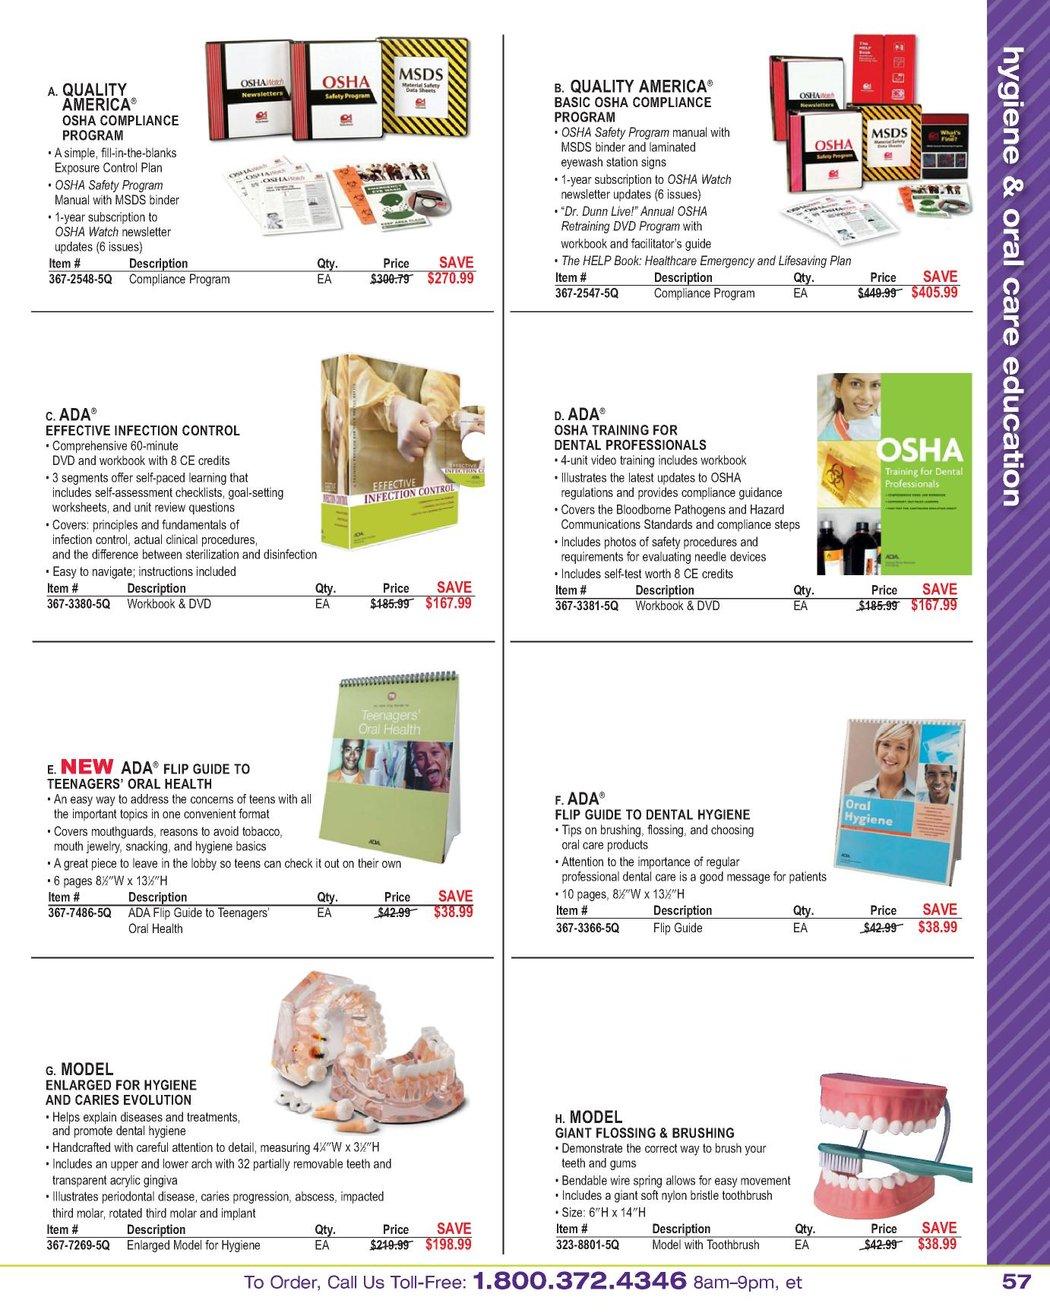 Workbooks infection control workbook : Dental Hygiene Source ADHA - January 2011 [56 - 57]